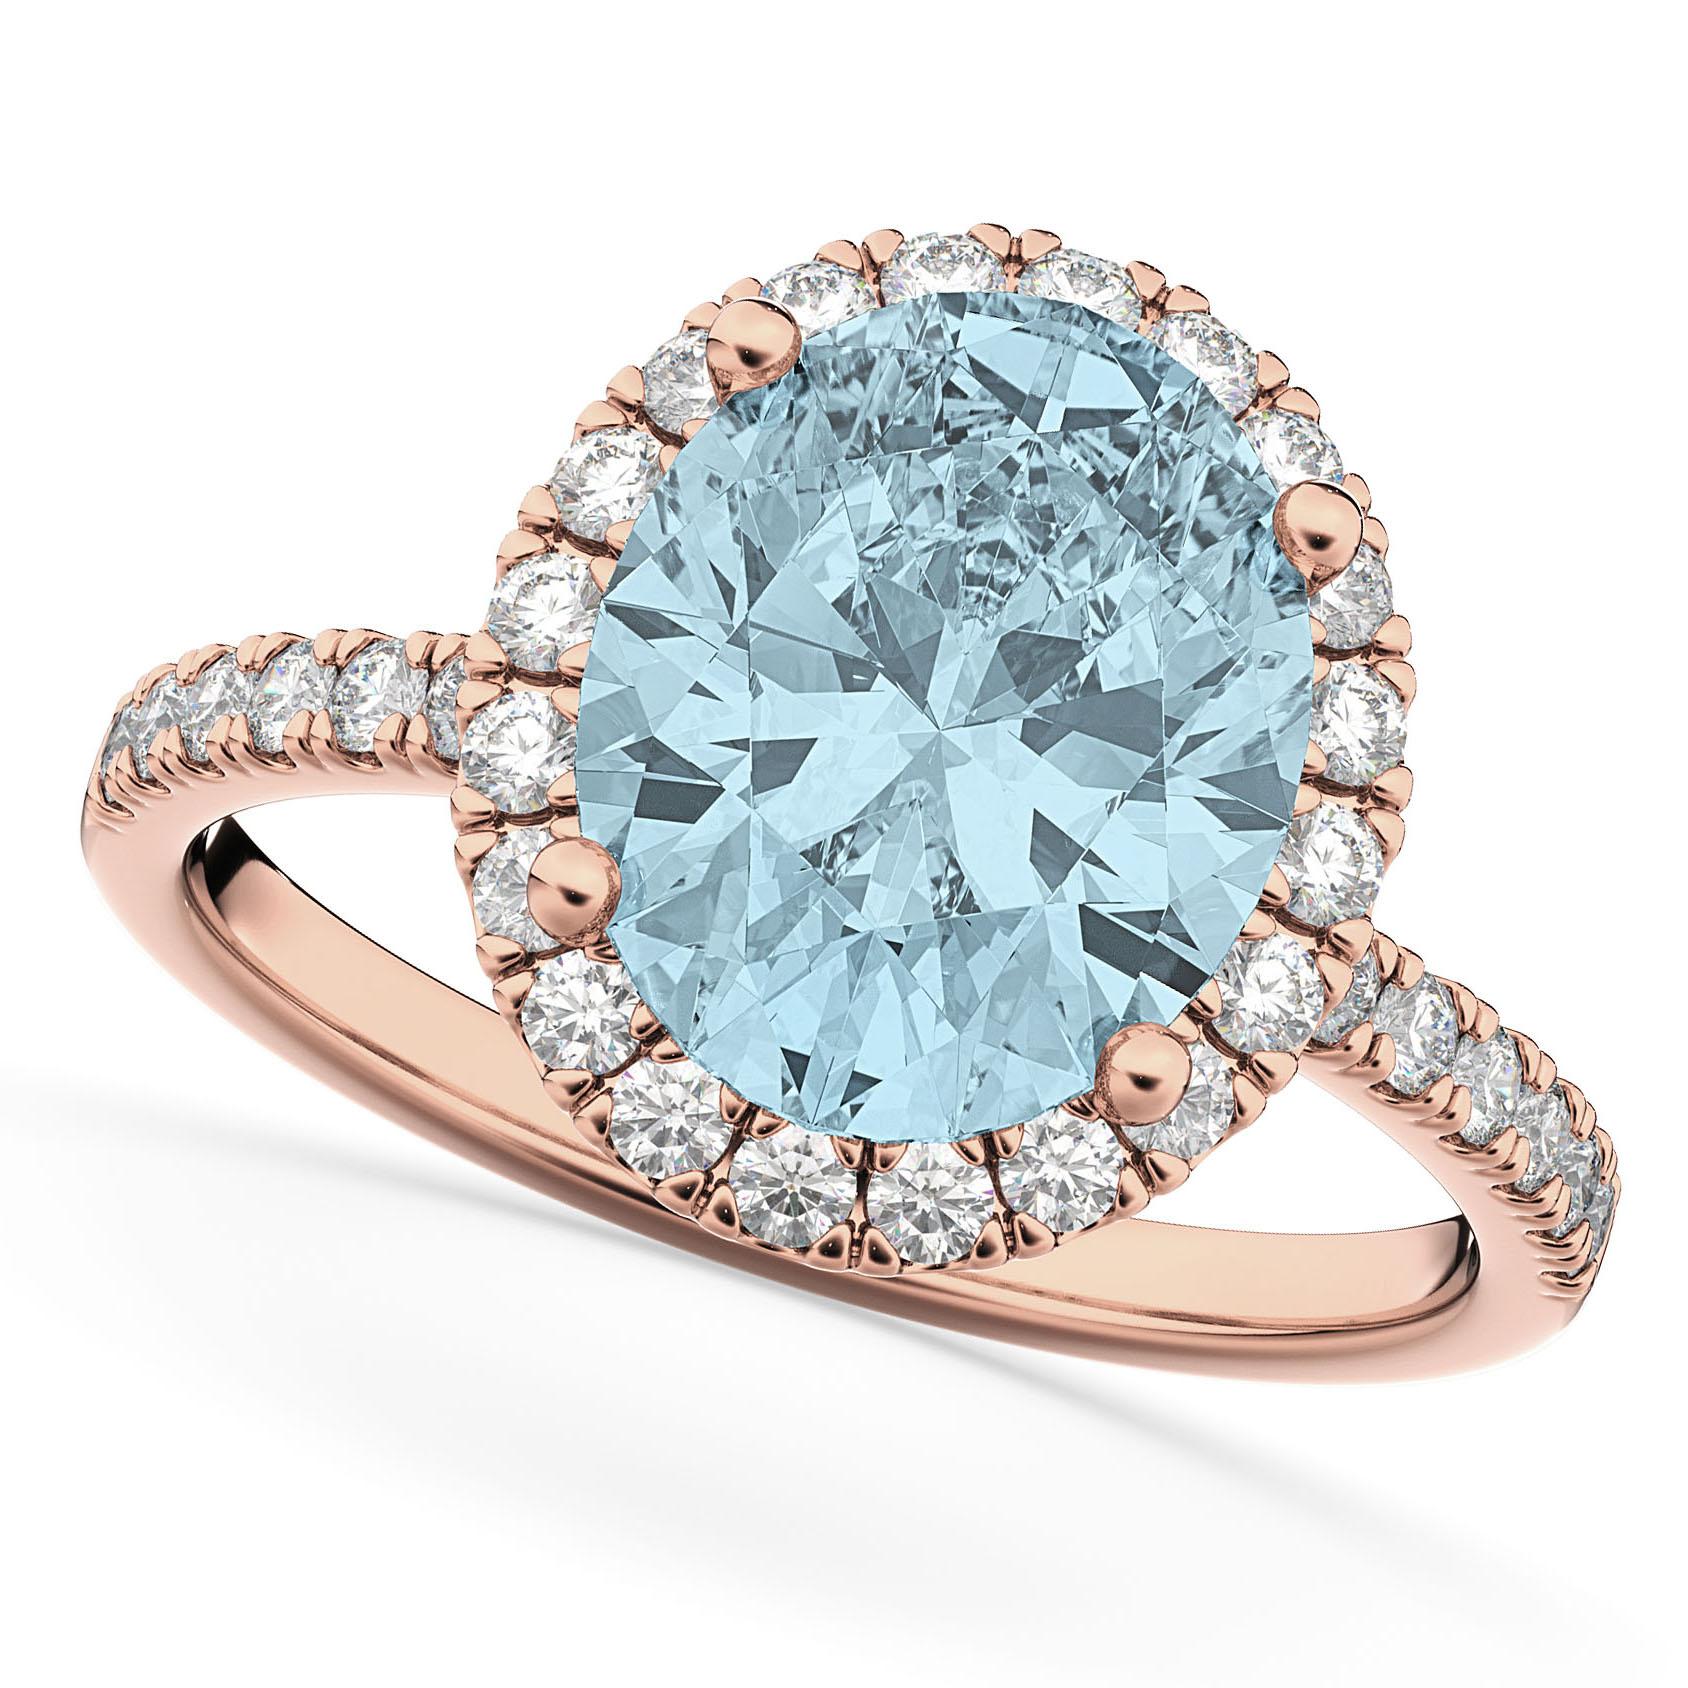 Oval Cut Halo Aquamarine & Diamond Engagement Ring 14K Rose Gold 2.76ct